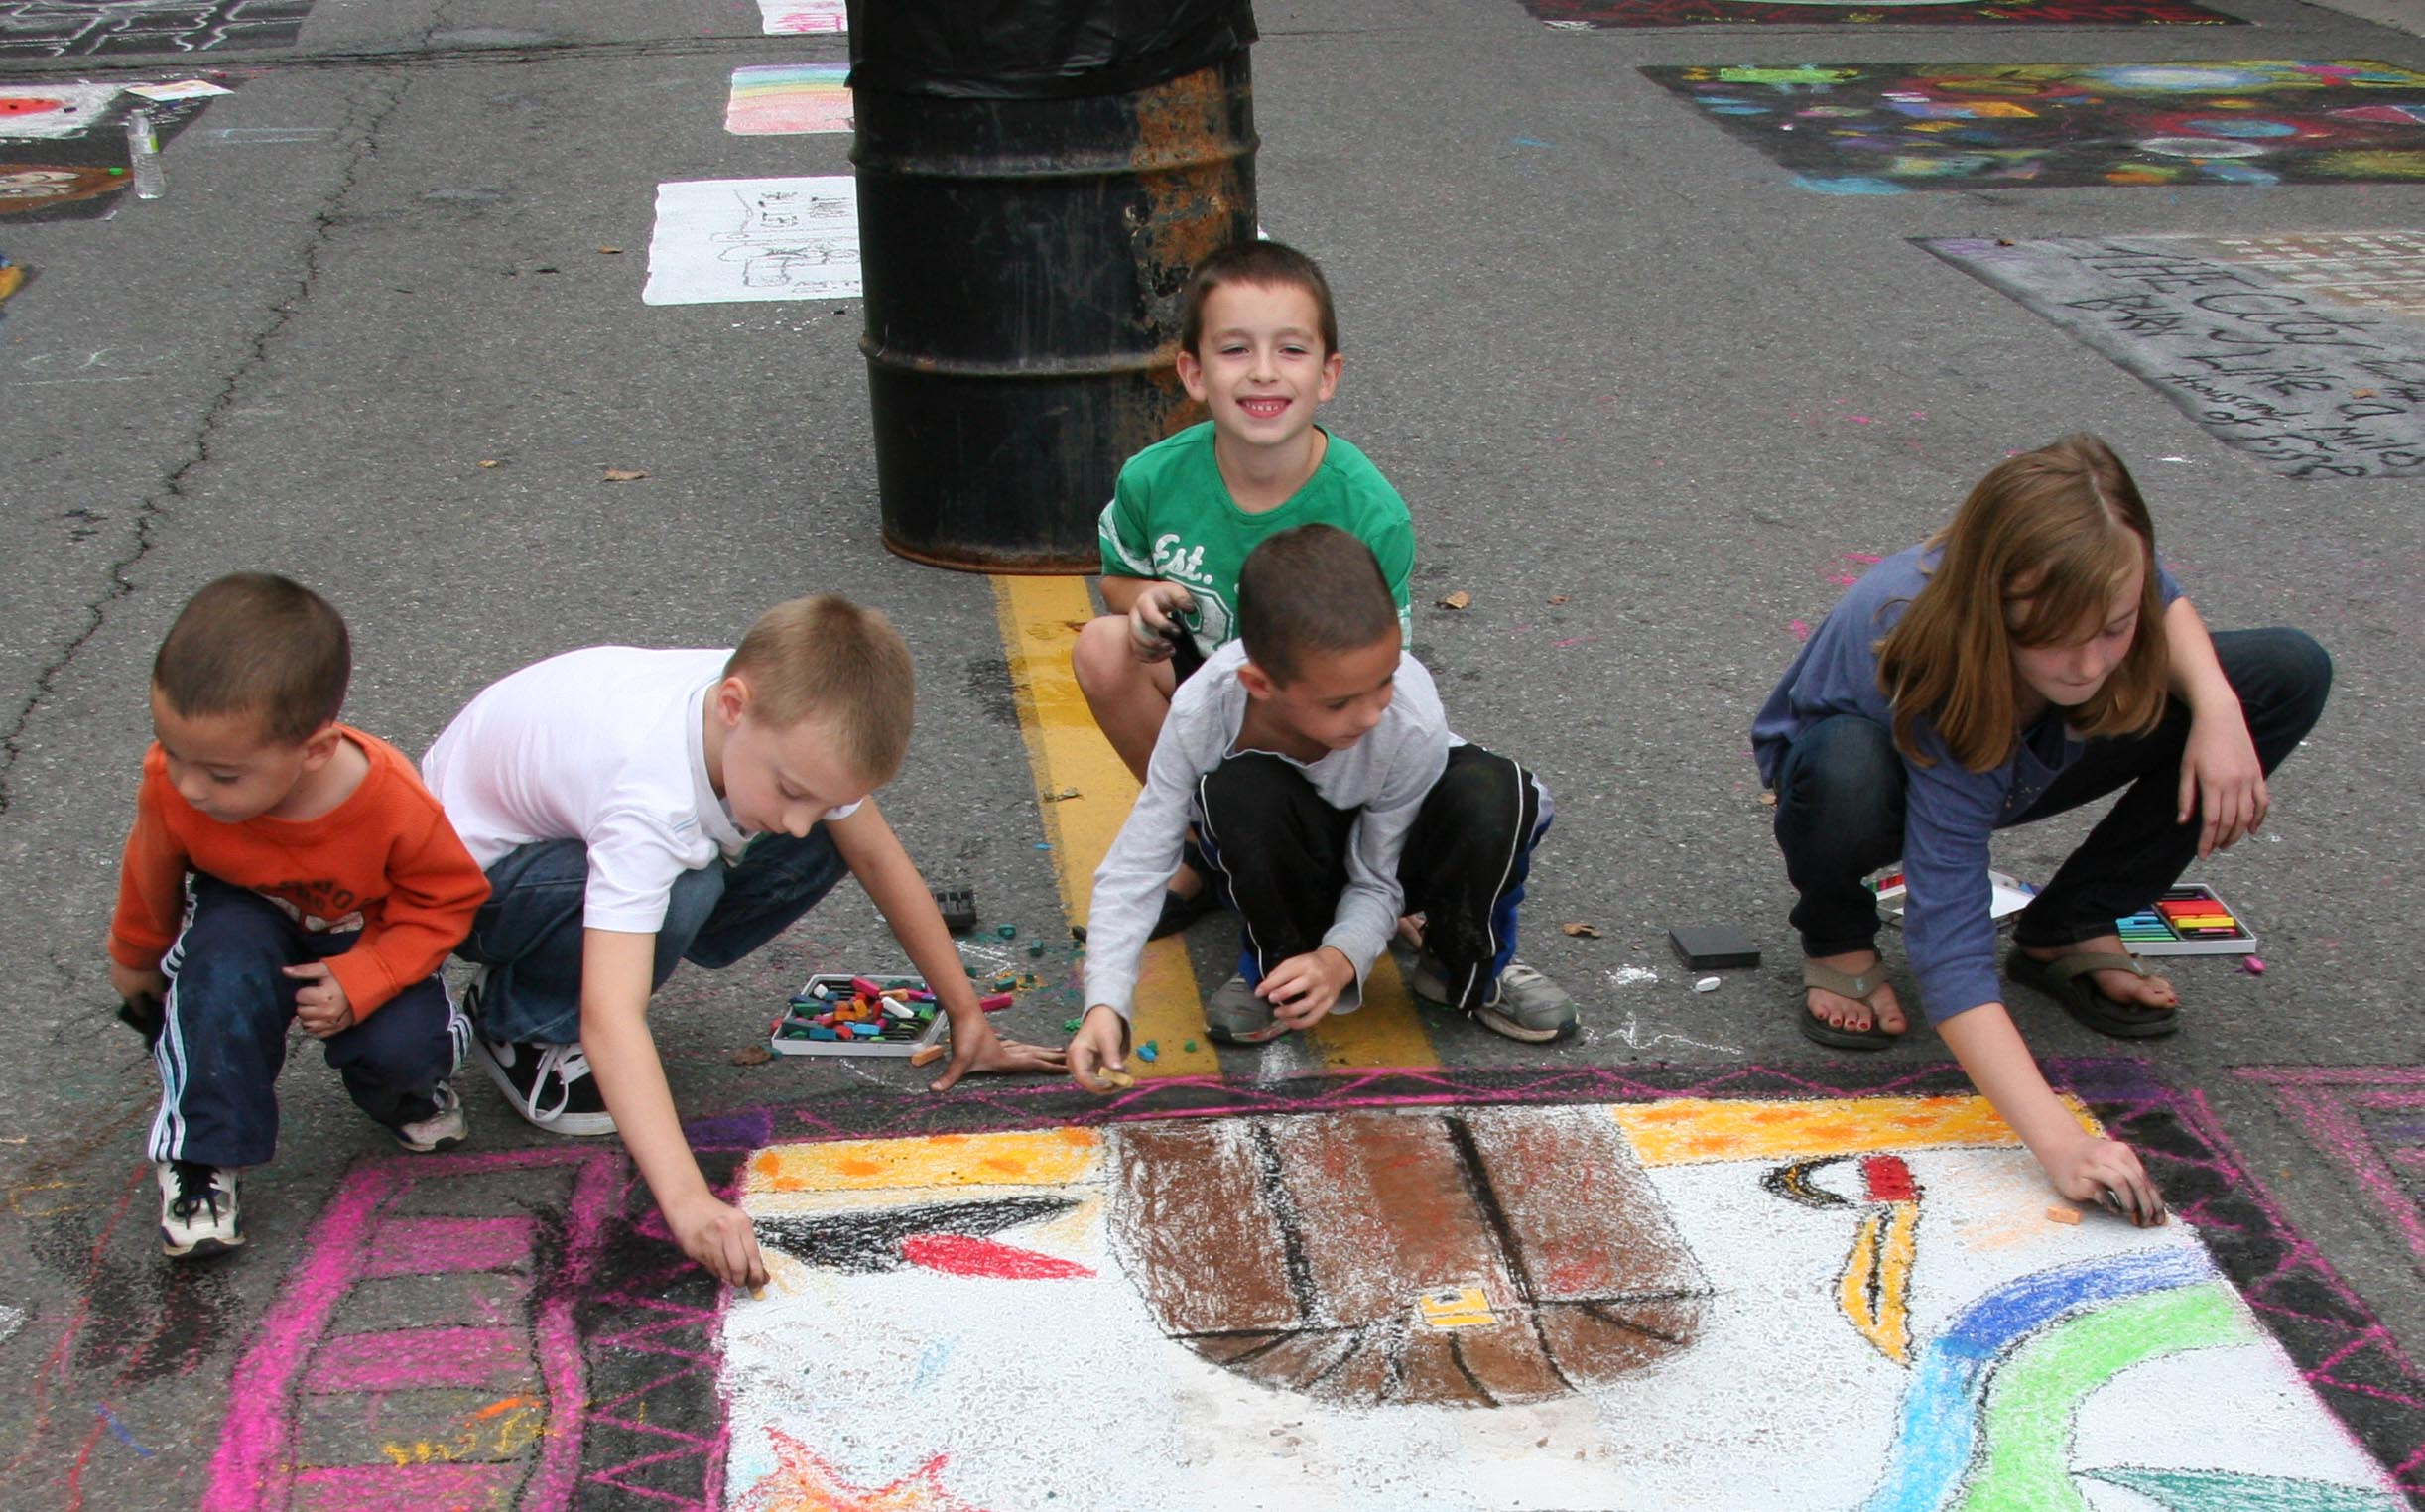 2012 Tivoli Street Painting Festival participants